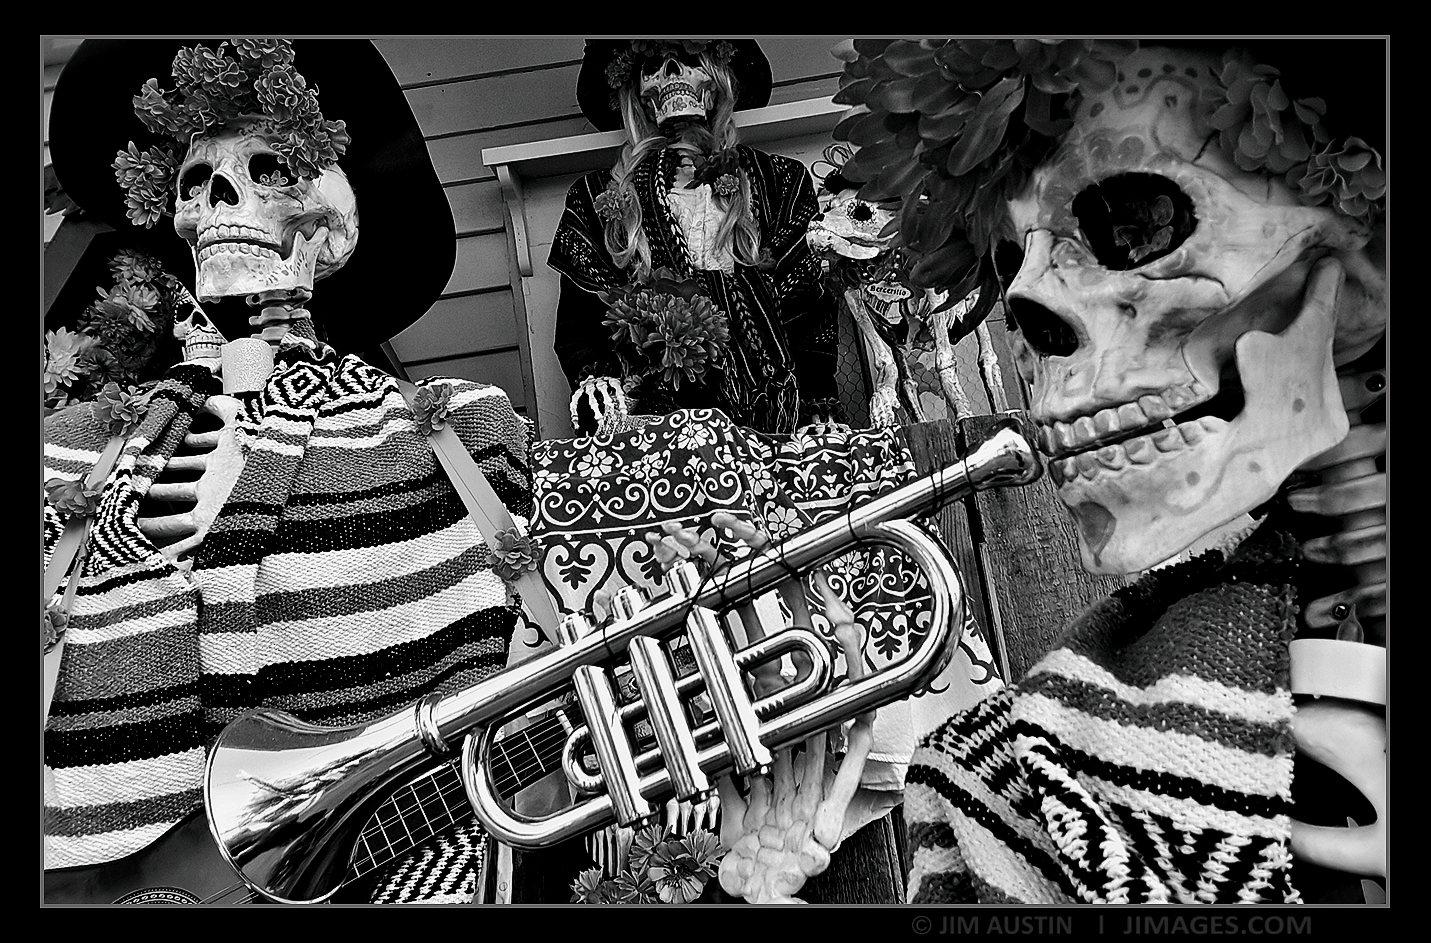 Dead But still in Tune Saint Augustine, Florida, Copyright Jim Austin Jimages.